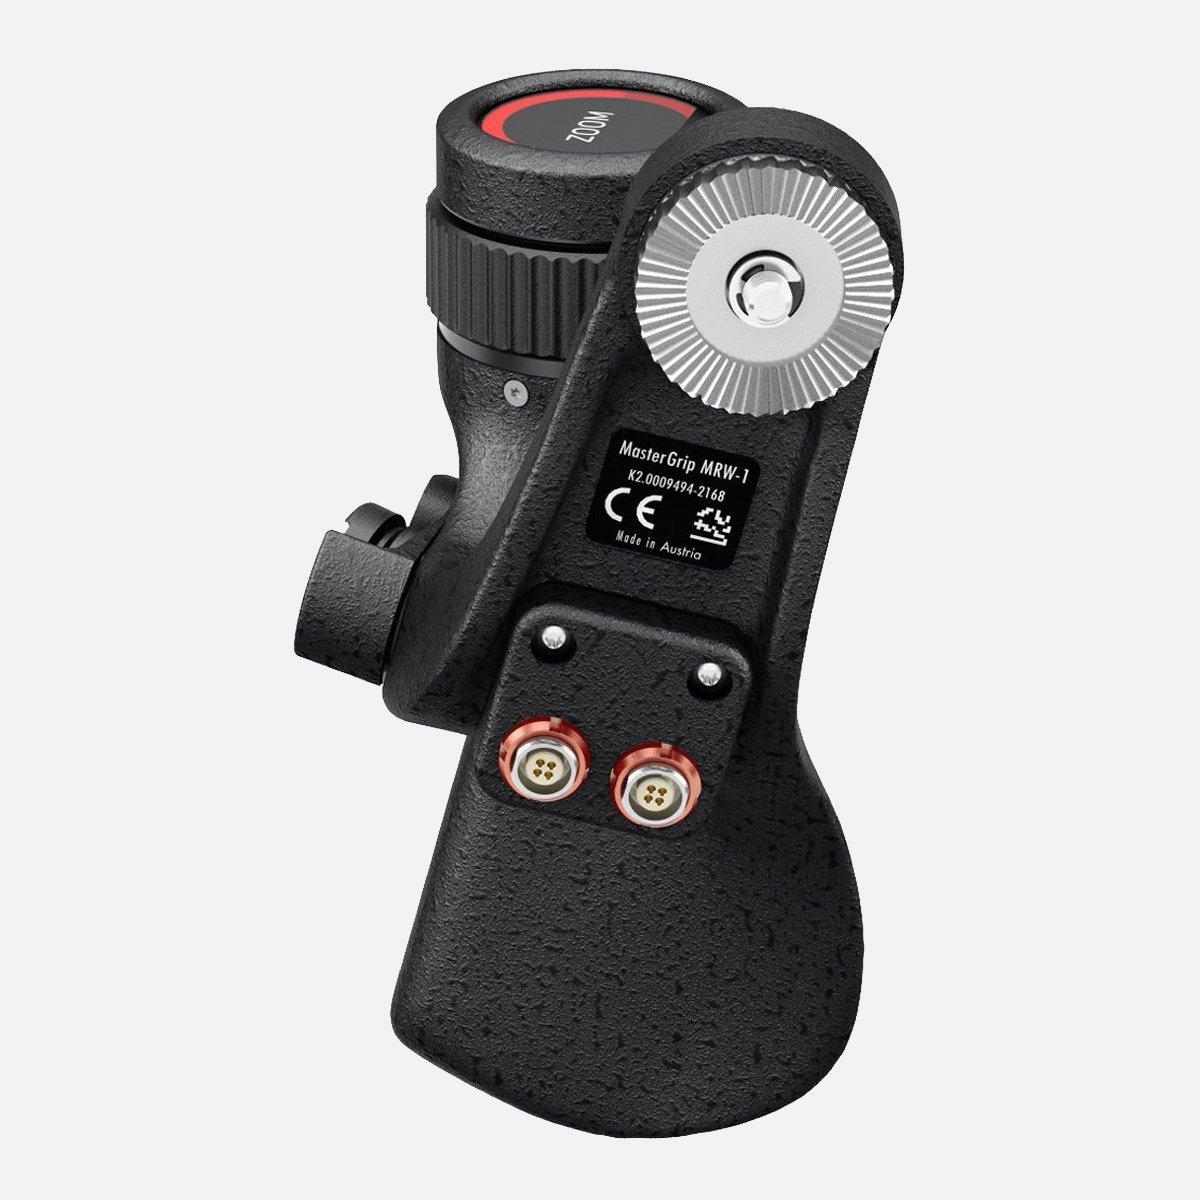 ARRI Master Grip Right Wheel MRW-1 Ultimate control